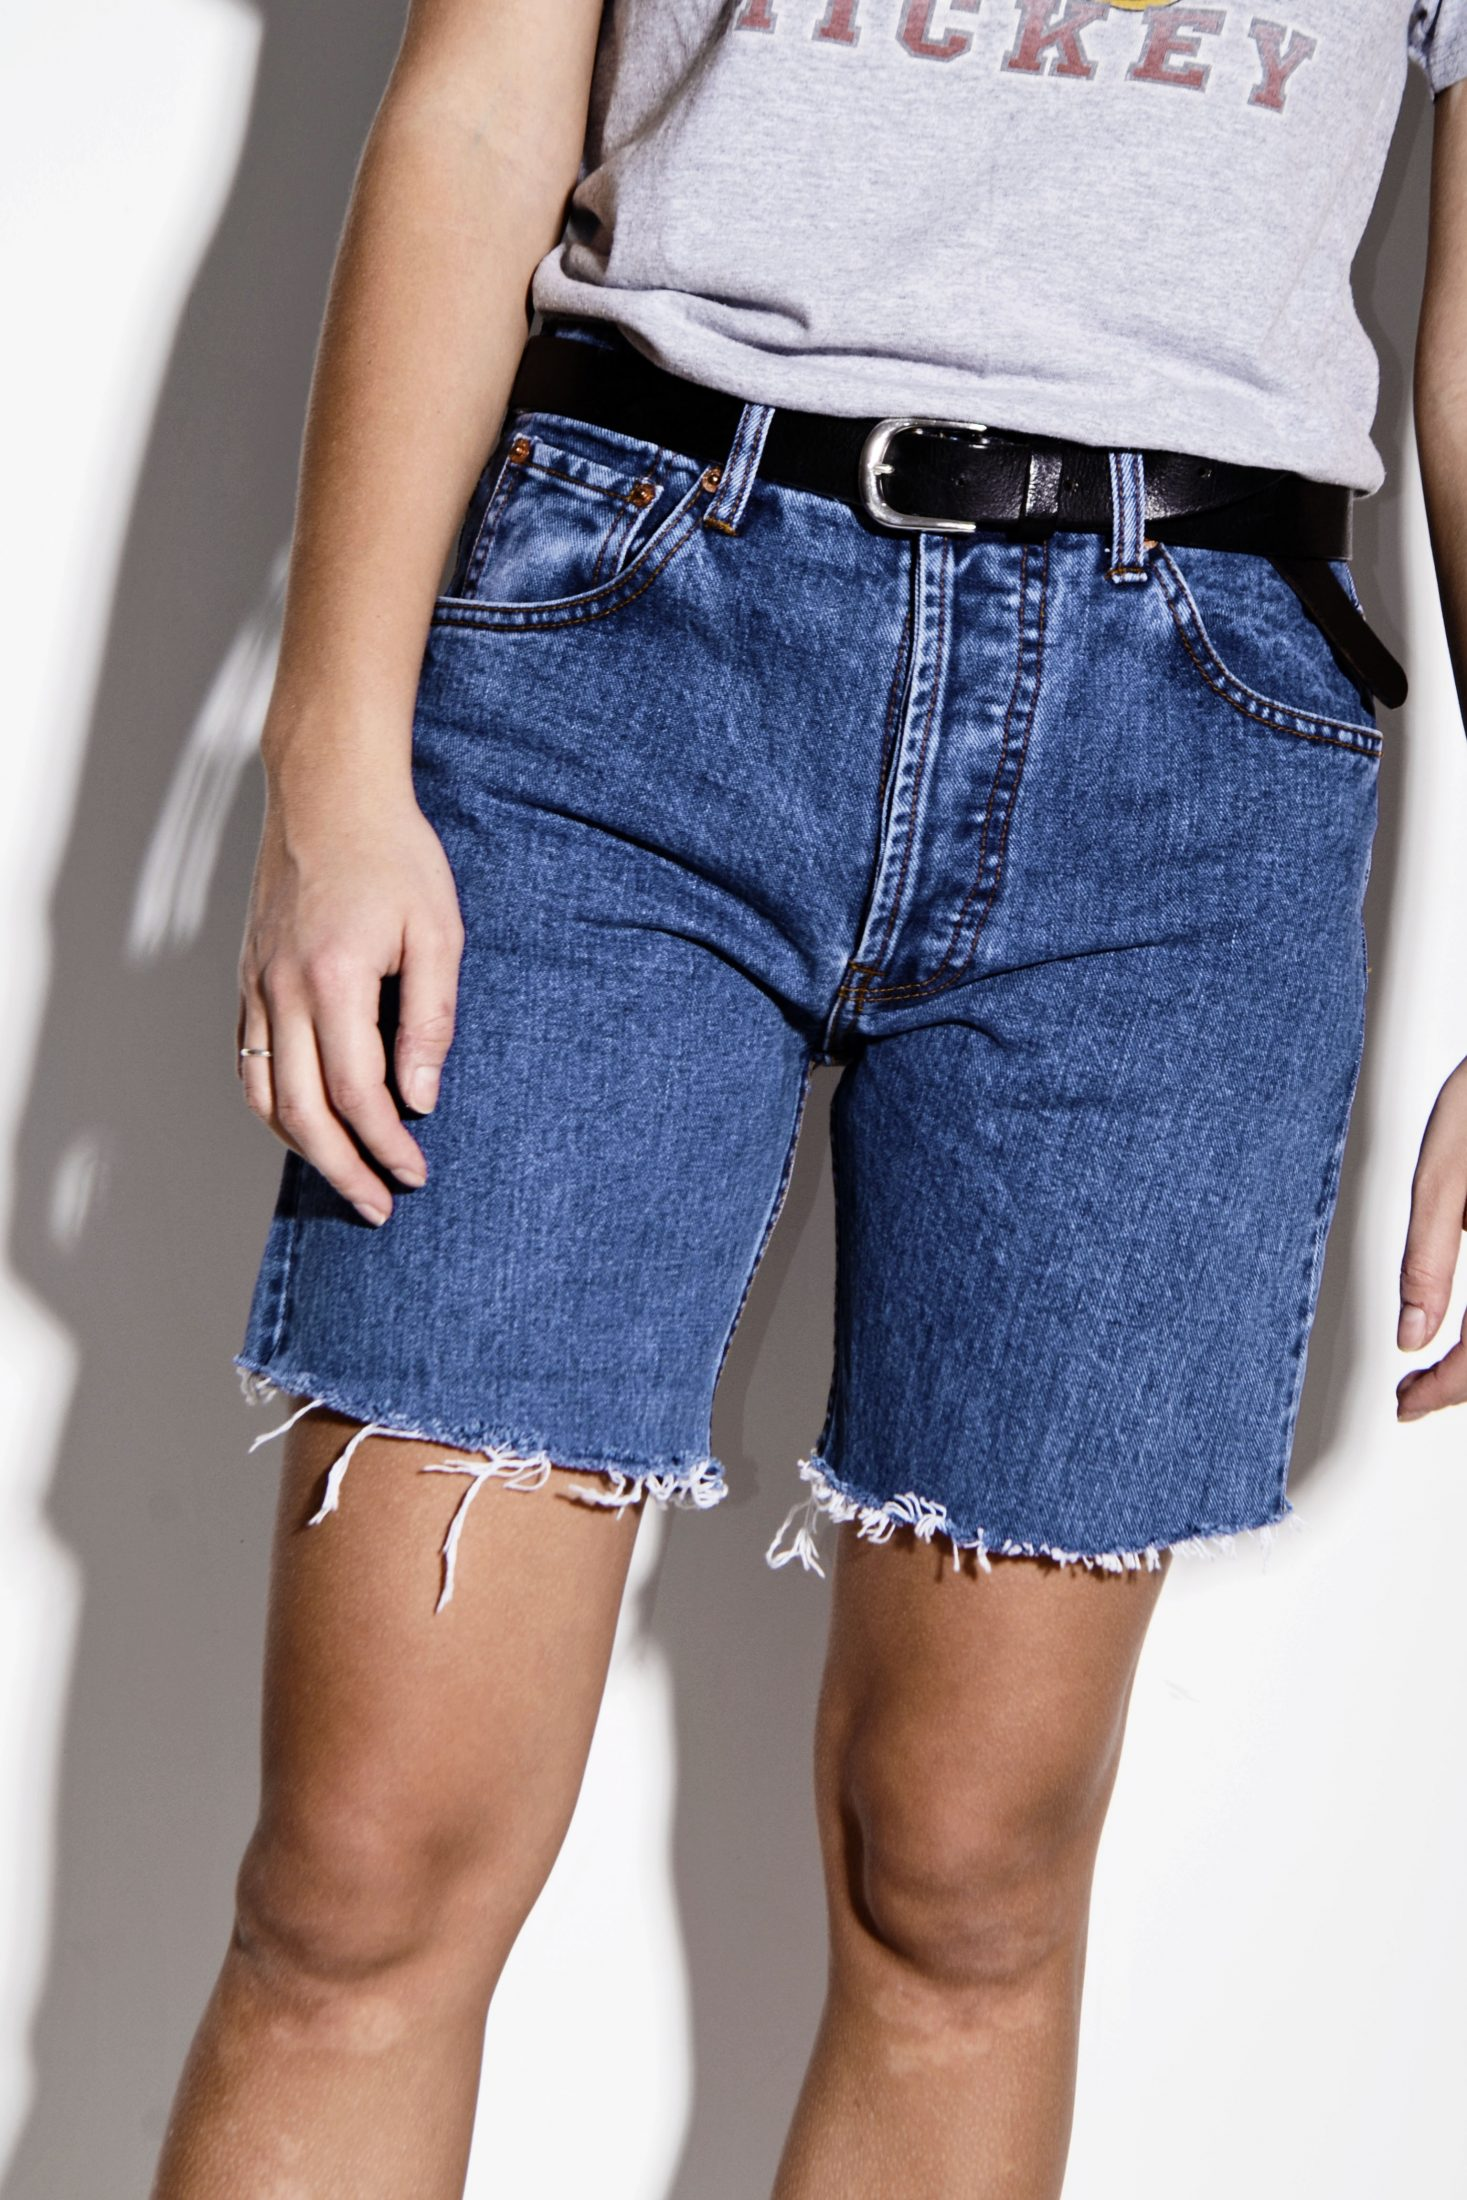 d1be4f3eae Adidas vintage shorts mens | HOT MILK vintage clothing online store ...